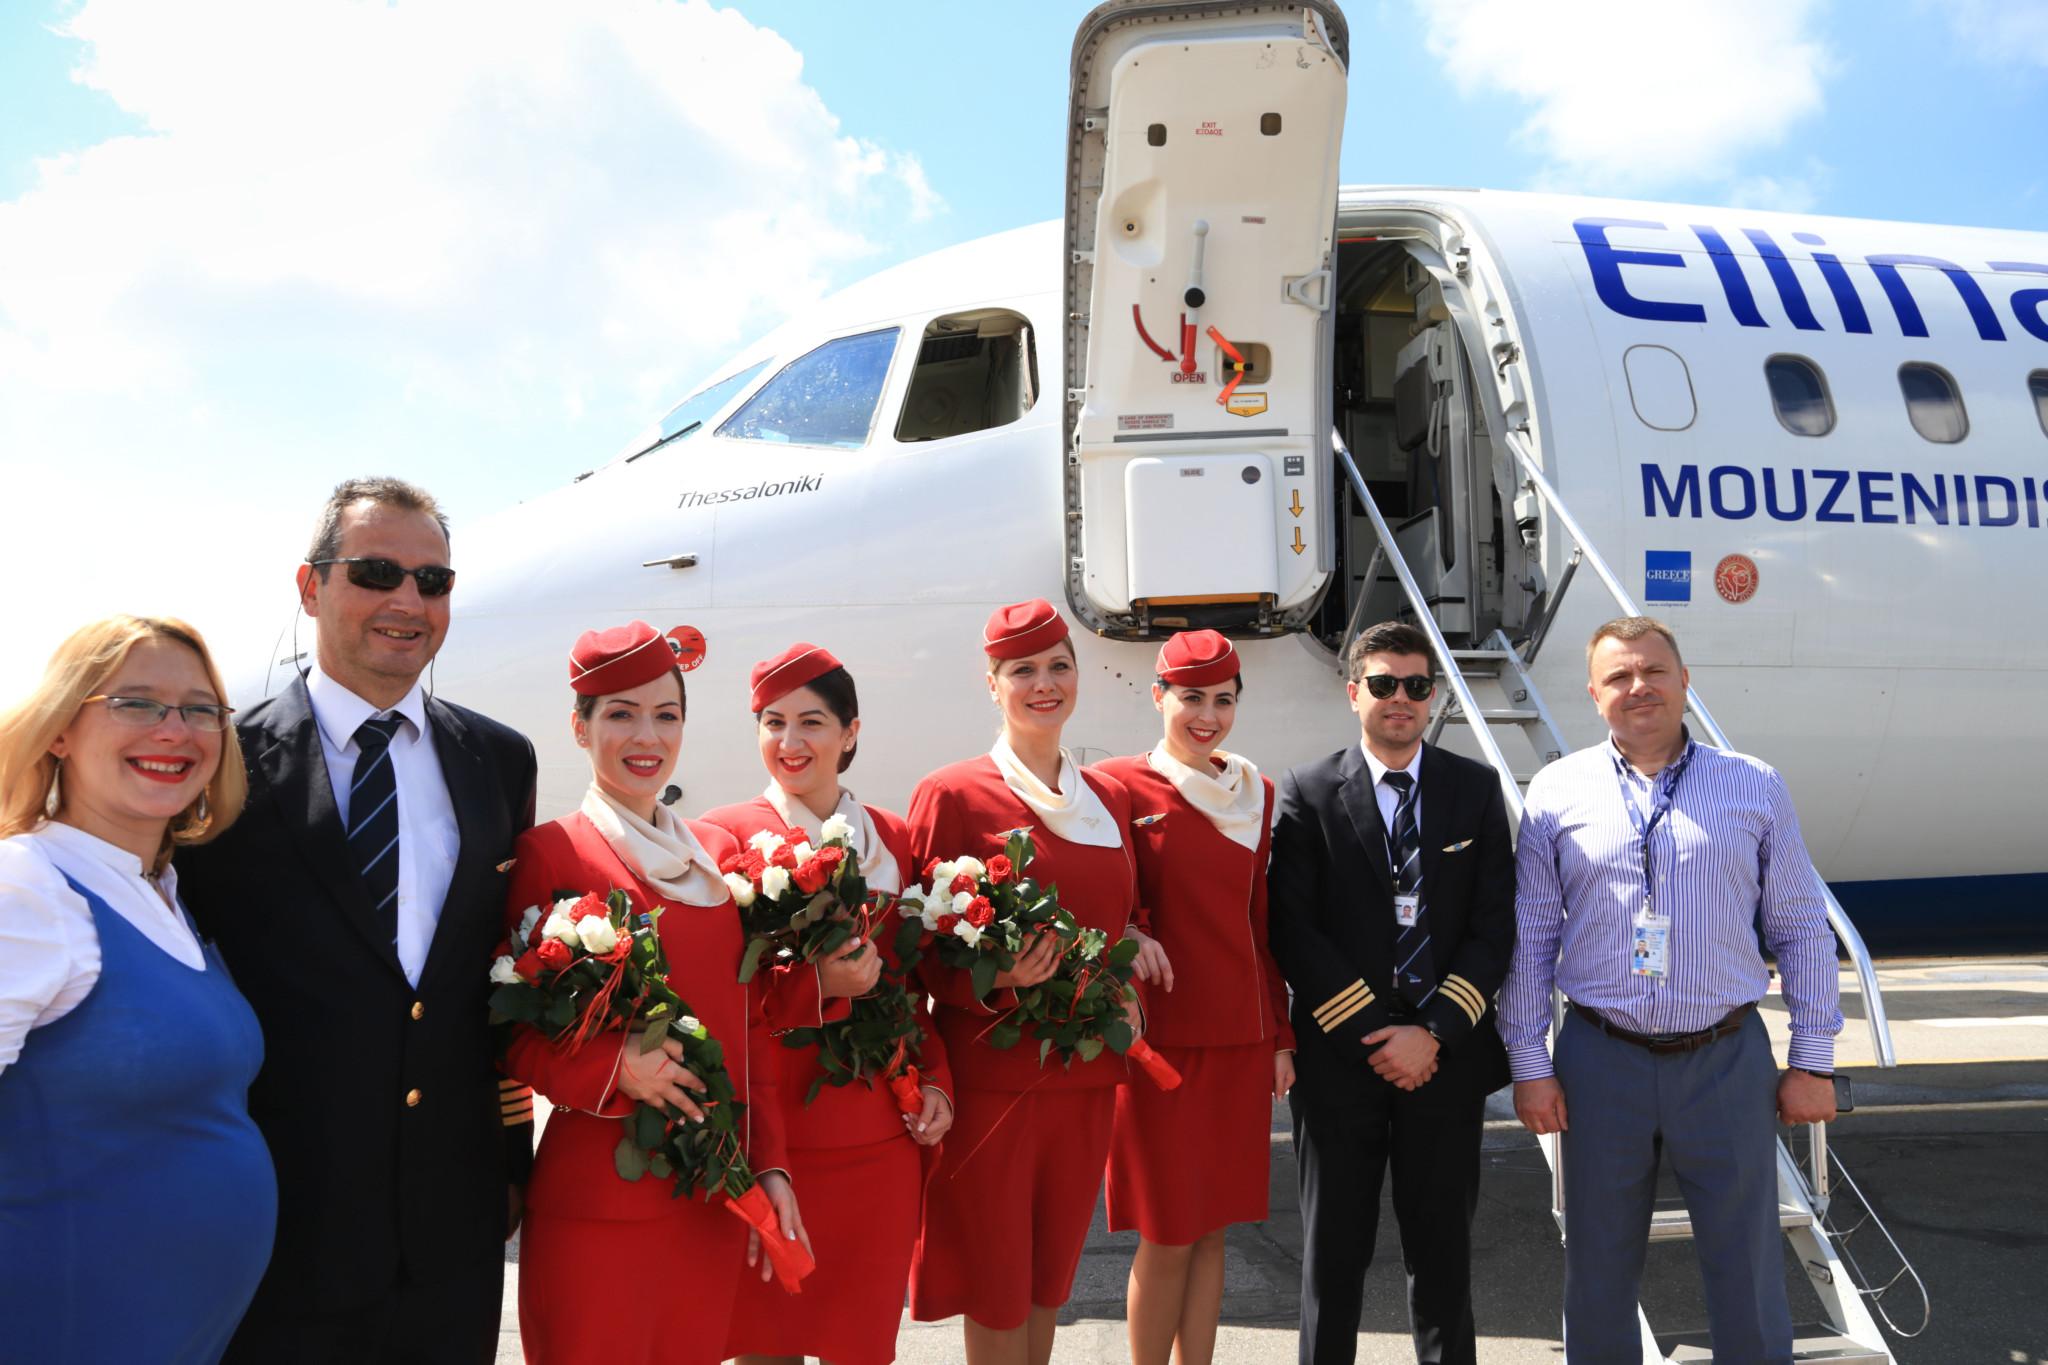 Два часа до Греции: в Одессе с танцами открыли летний авиарейс (фото)